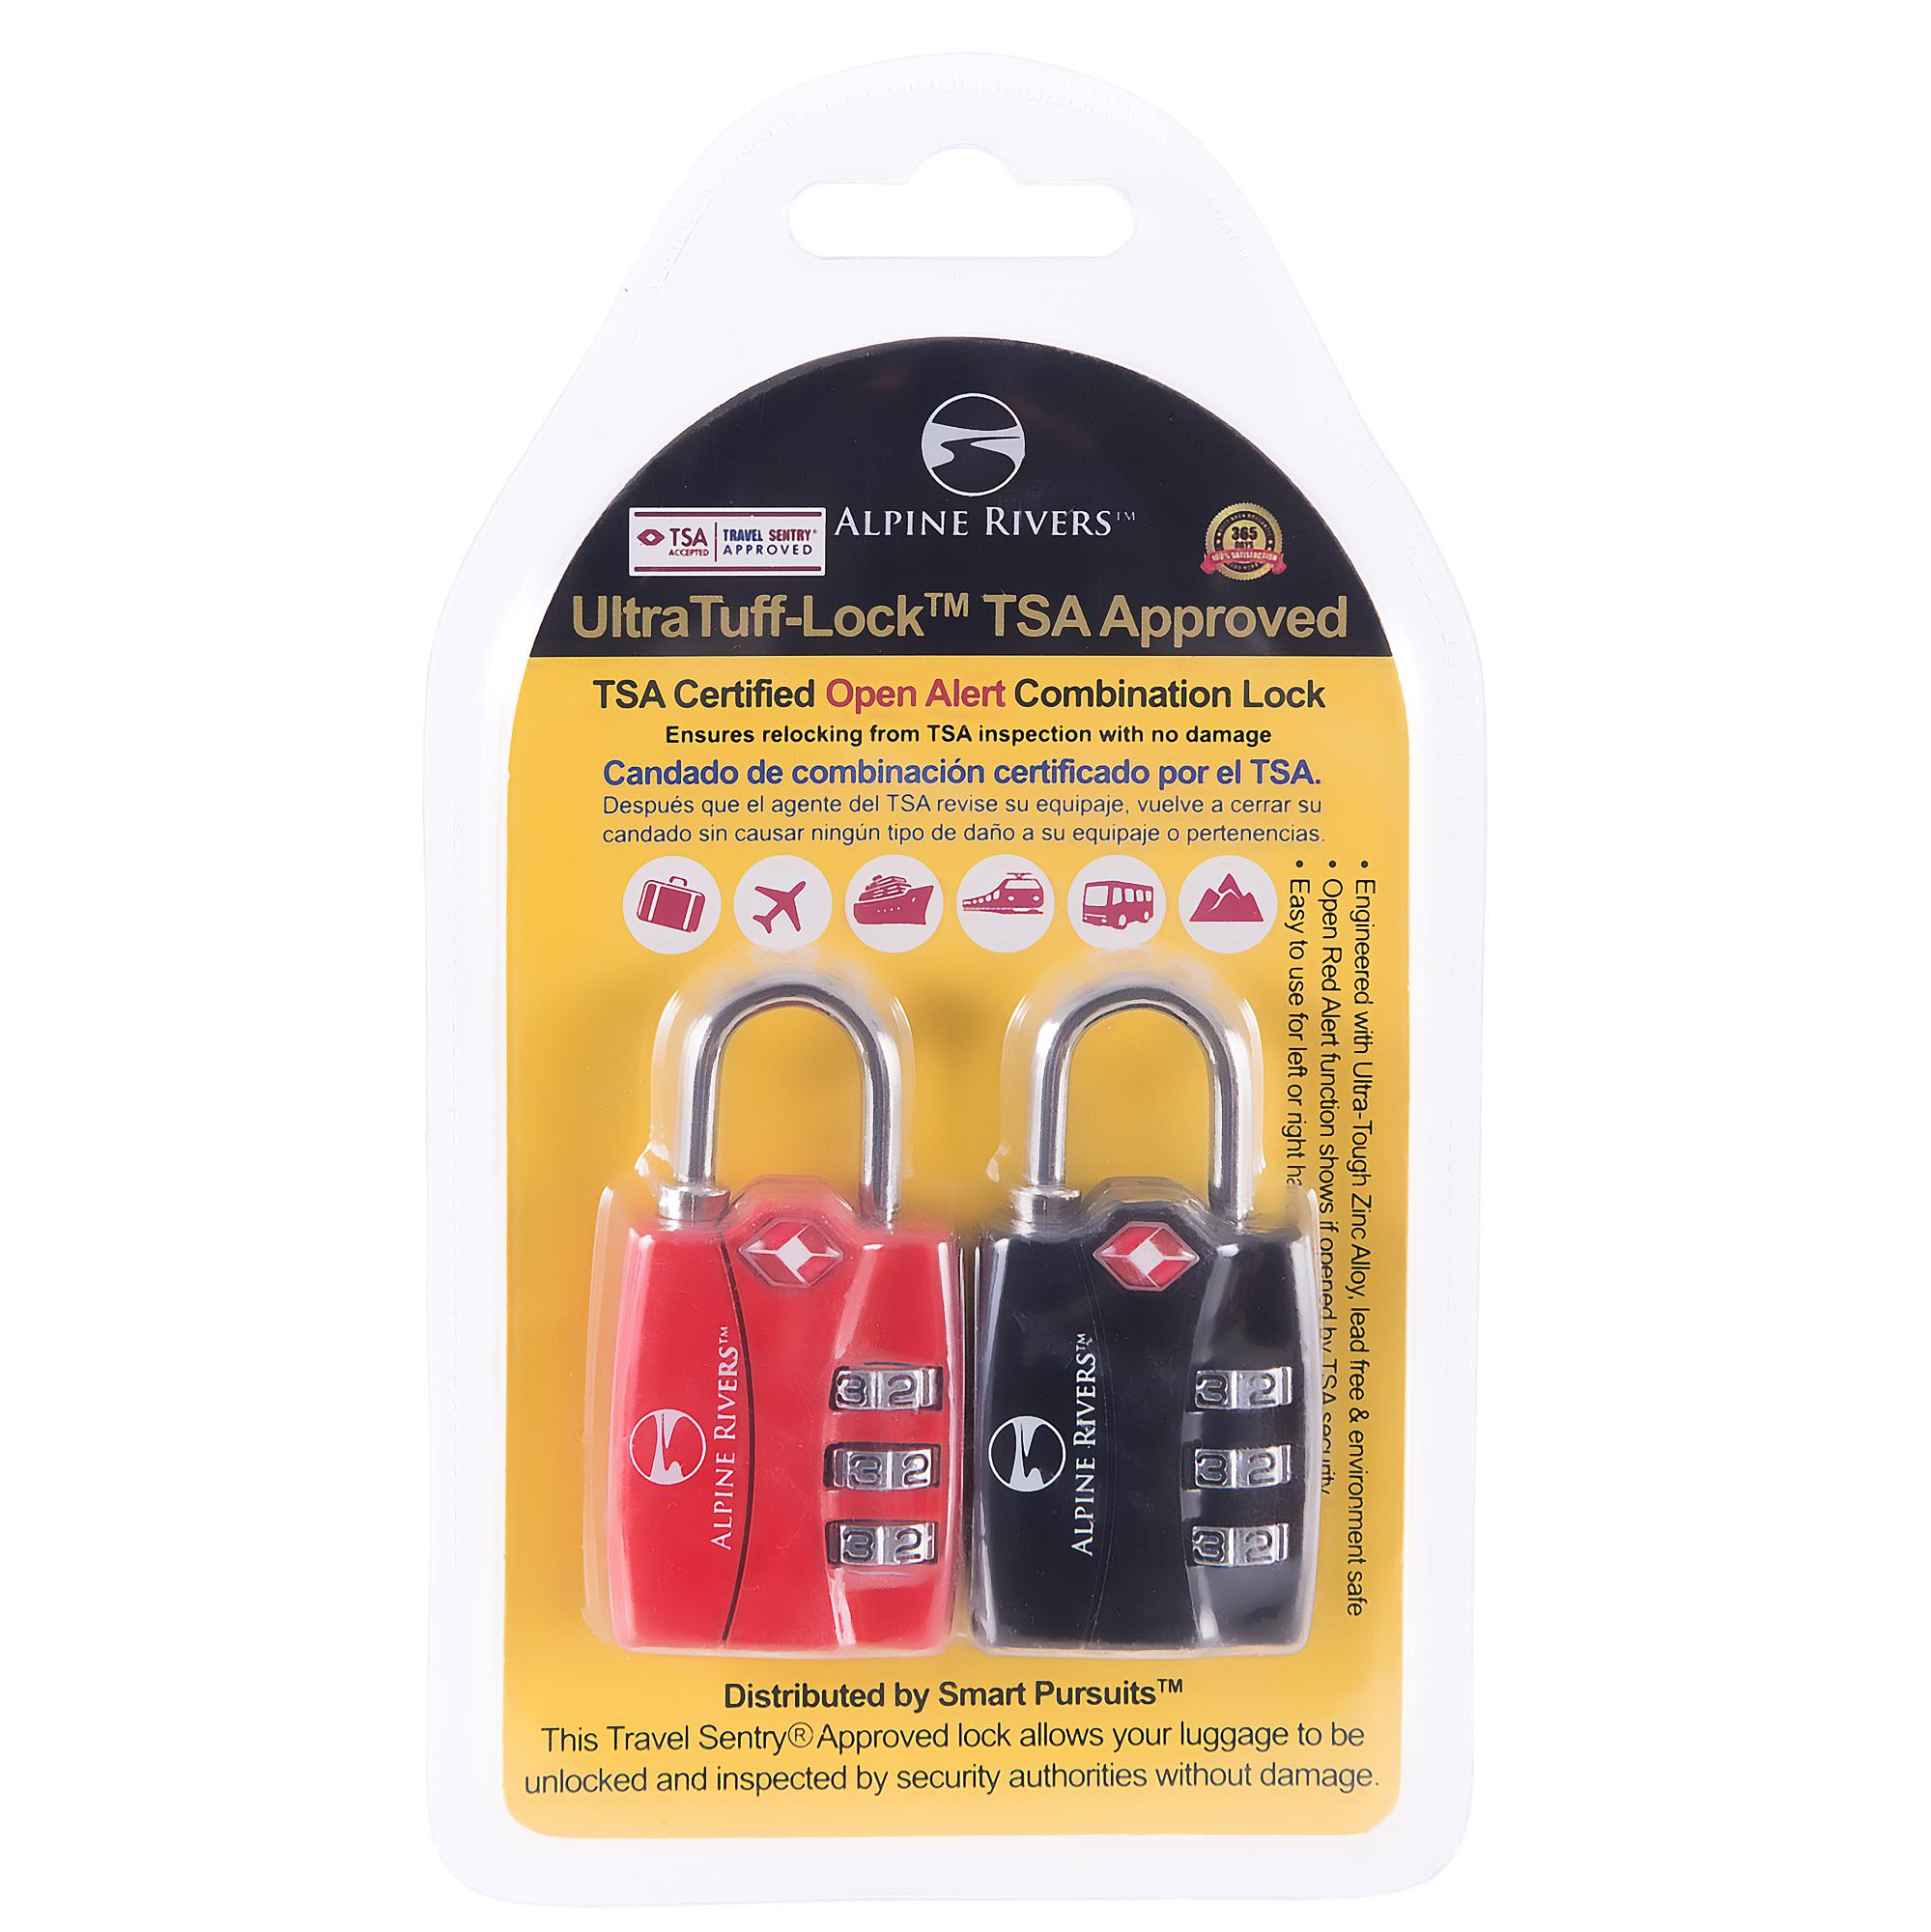 UltraTuff™ TSA Locks 2017 Design